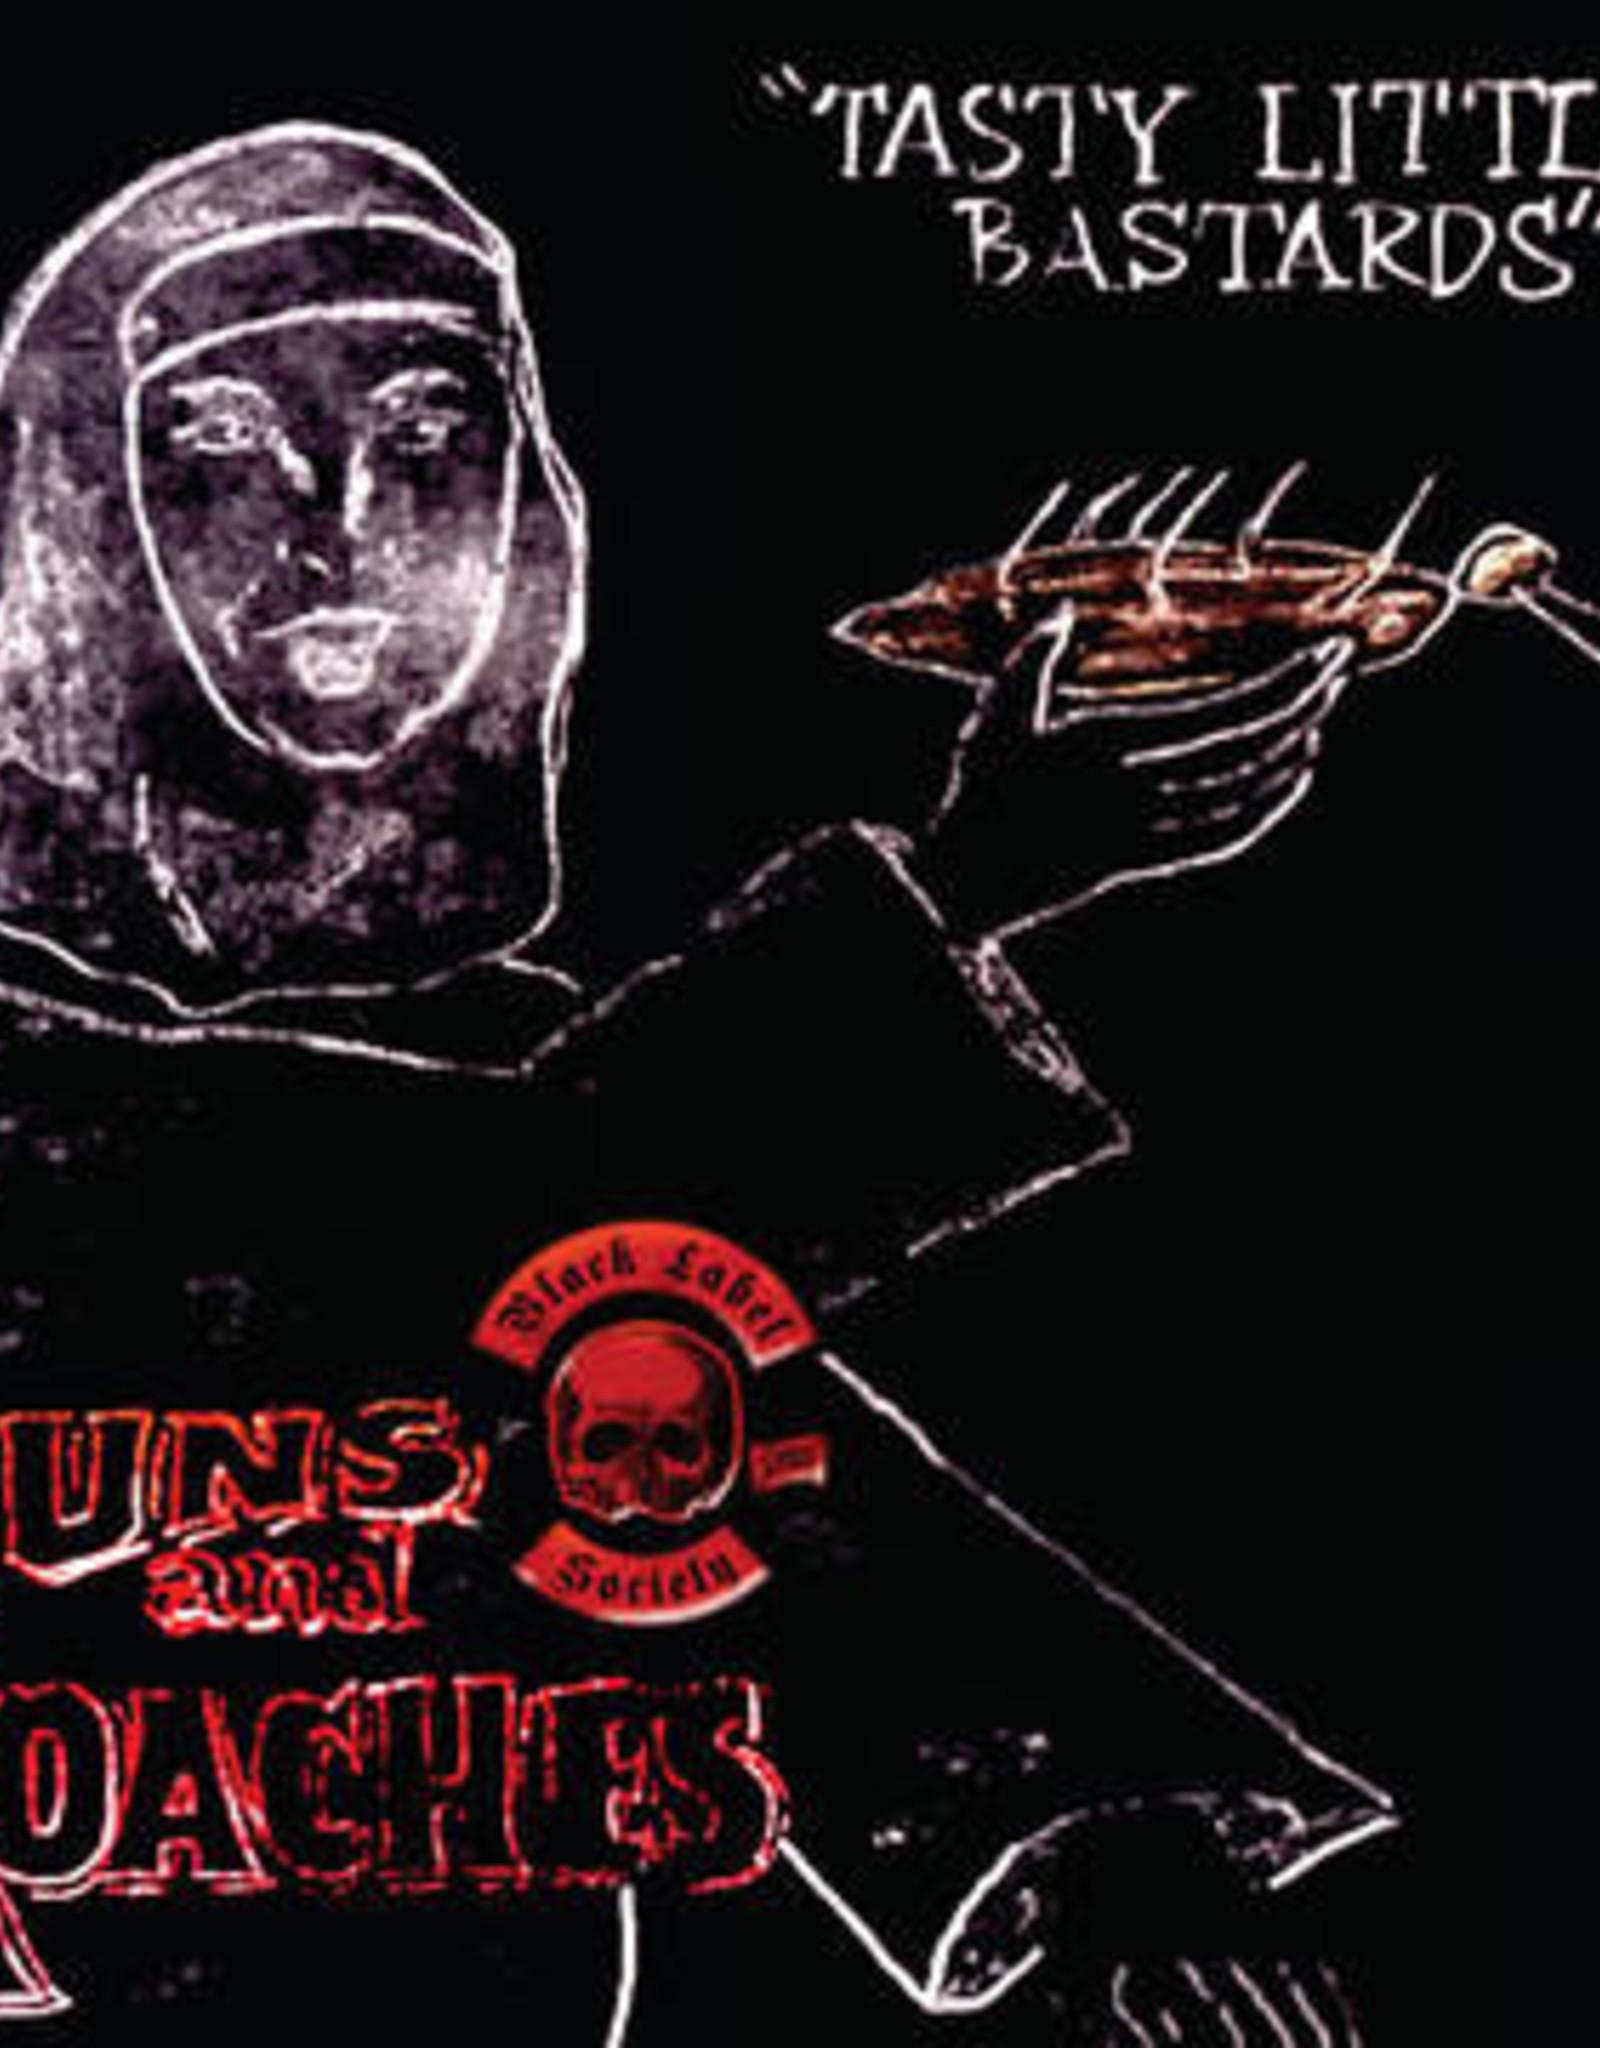 Black Label Society - Nuns & Roaches (Rsd)